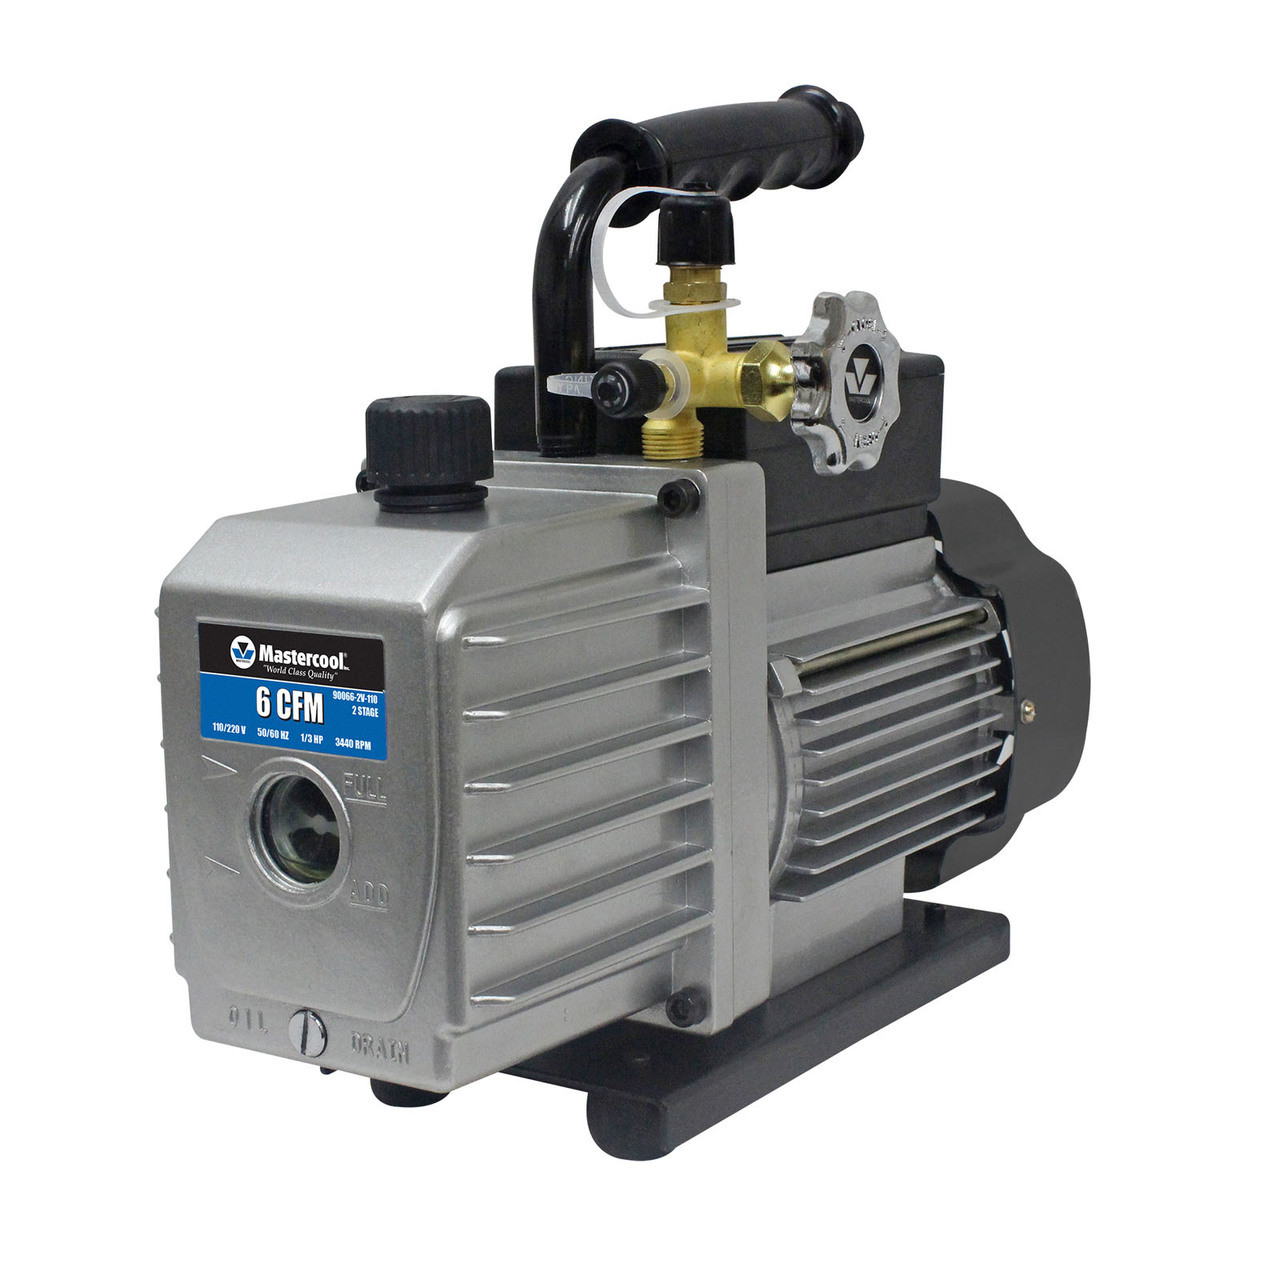 Fieldpiece VP55 Two Stage 5 CFM Vacuum Pump